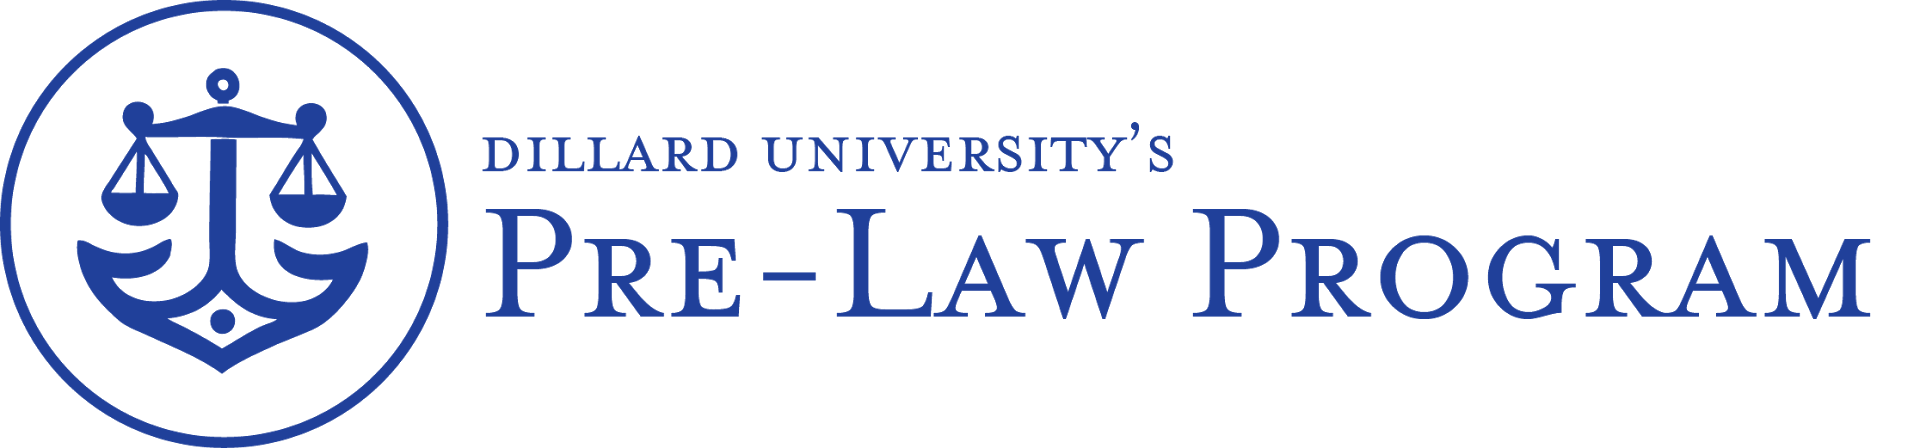 Dillard University Pre-Law